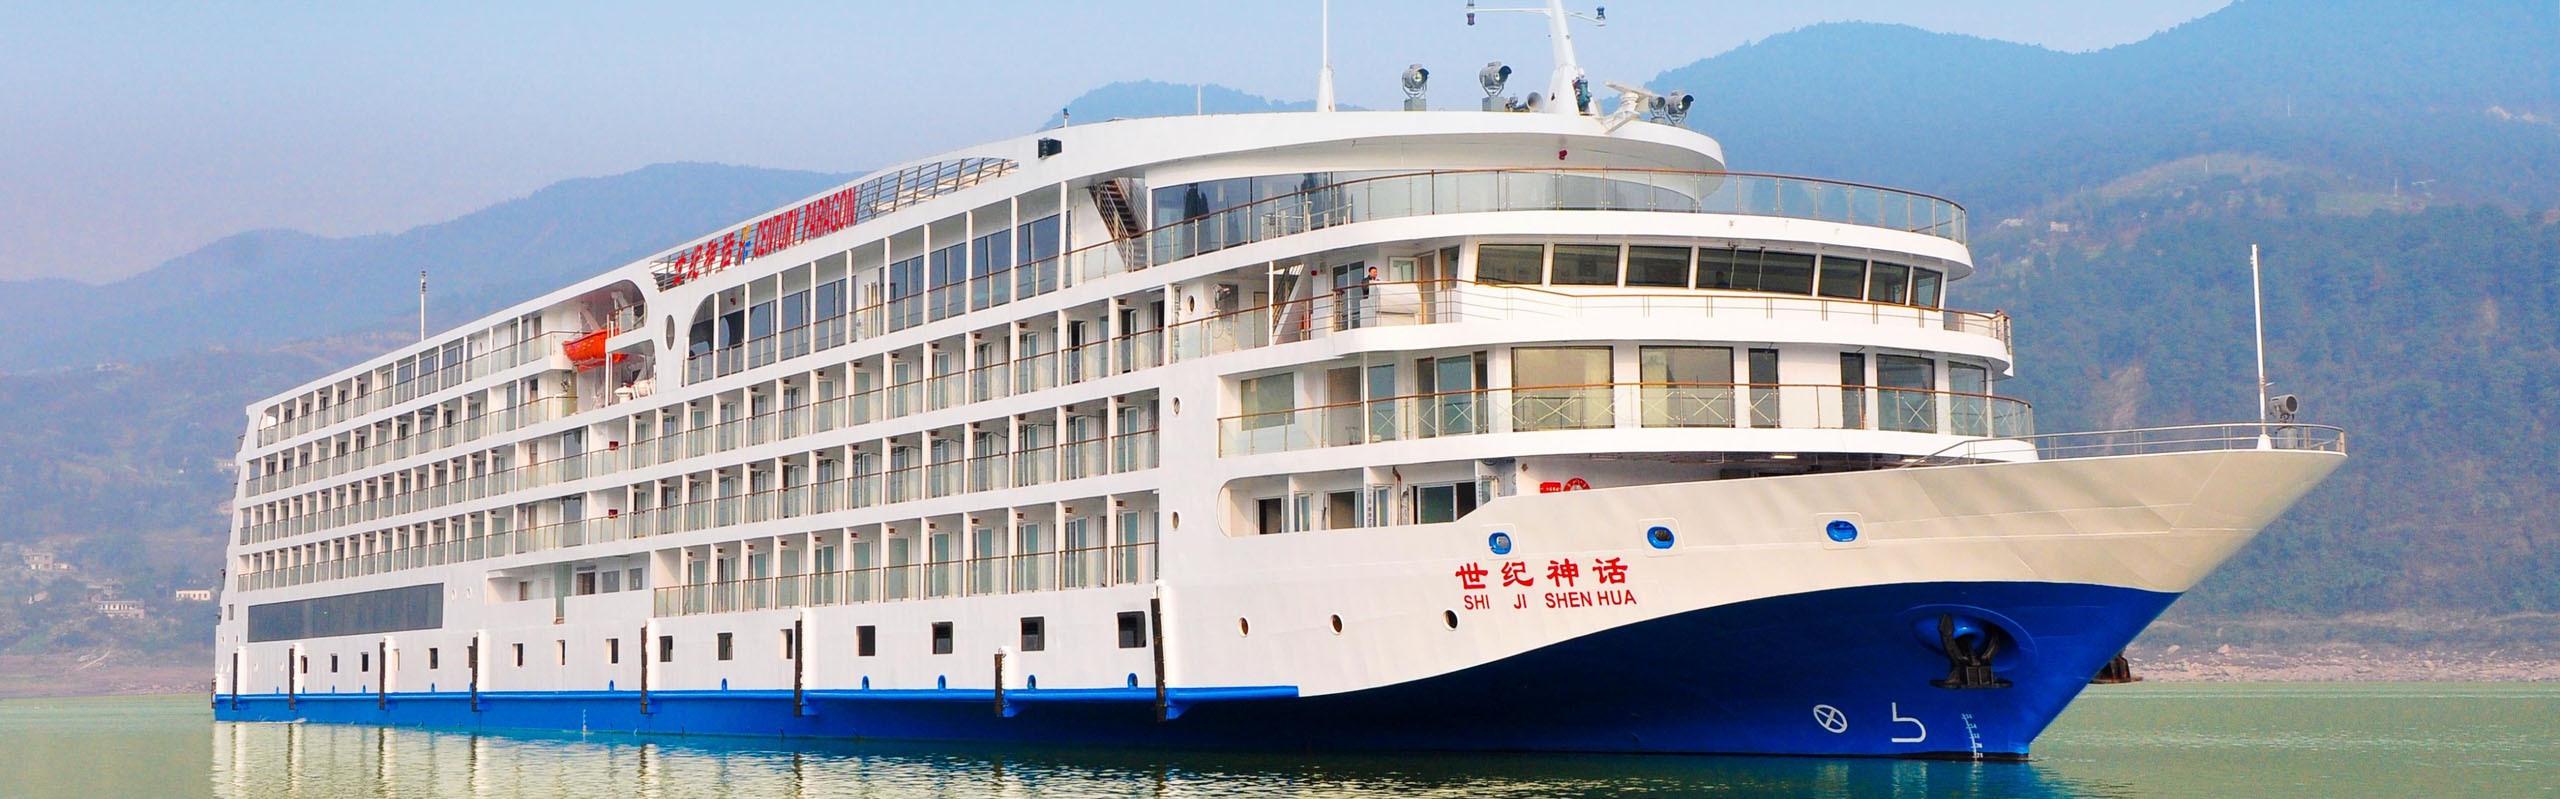 Century Paragon Cruise